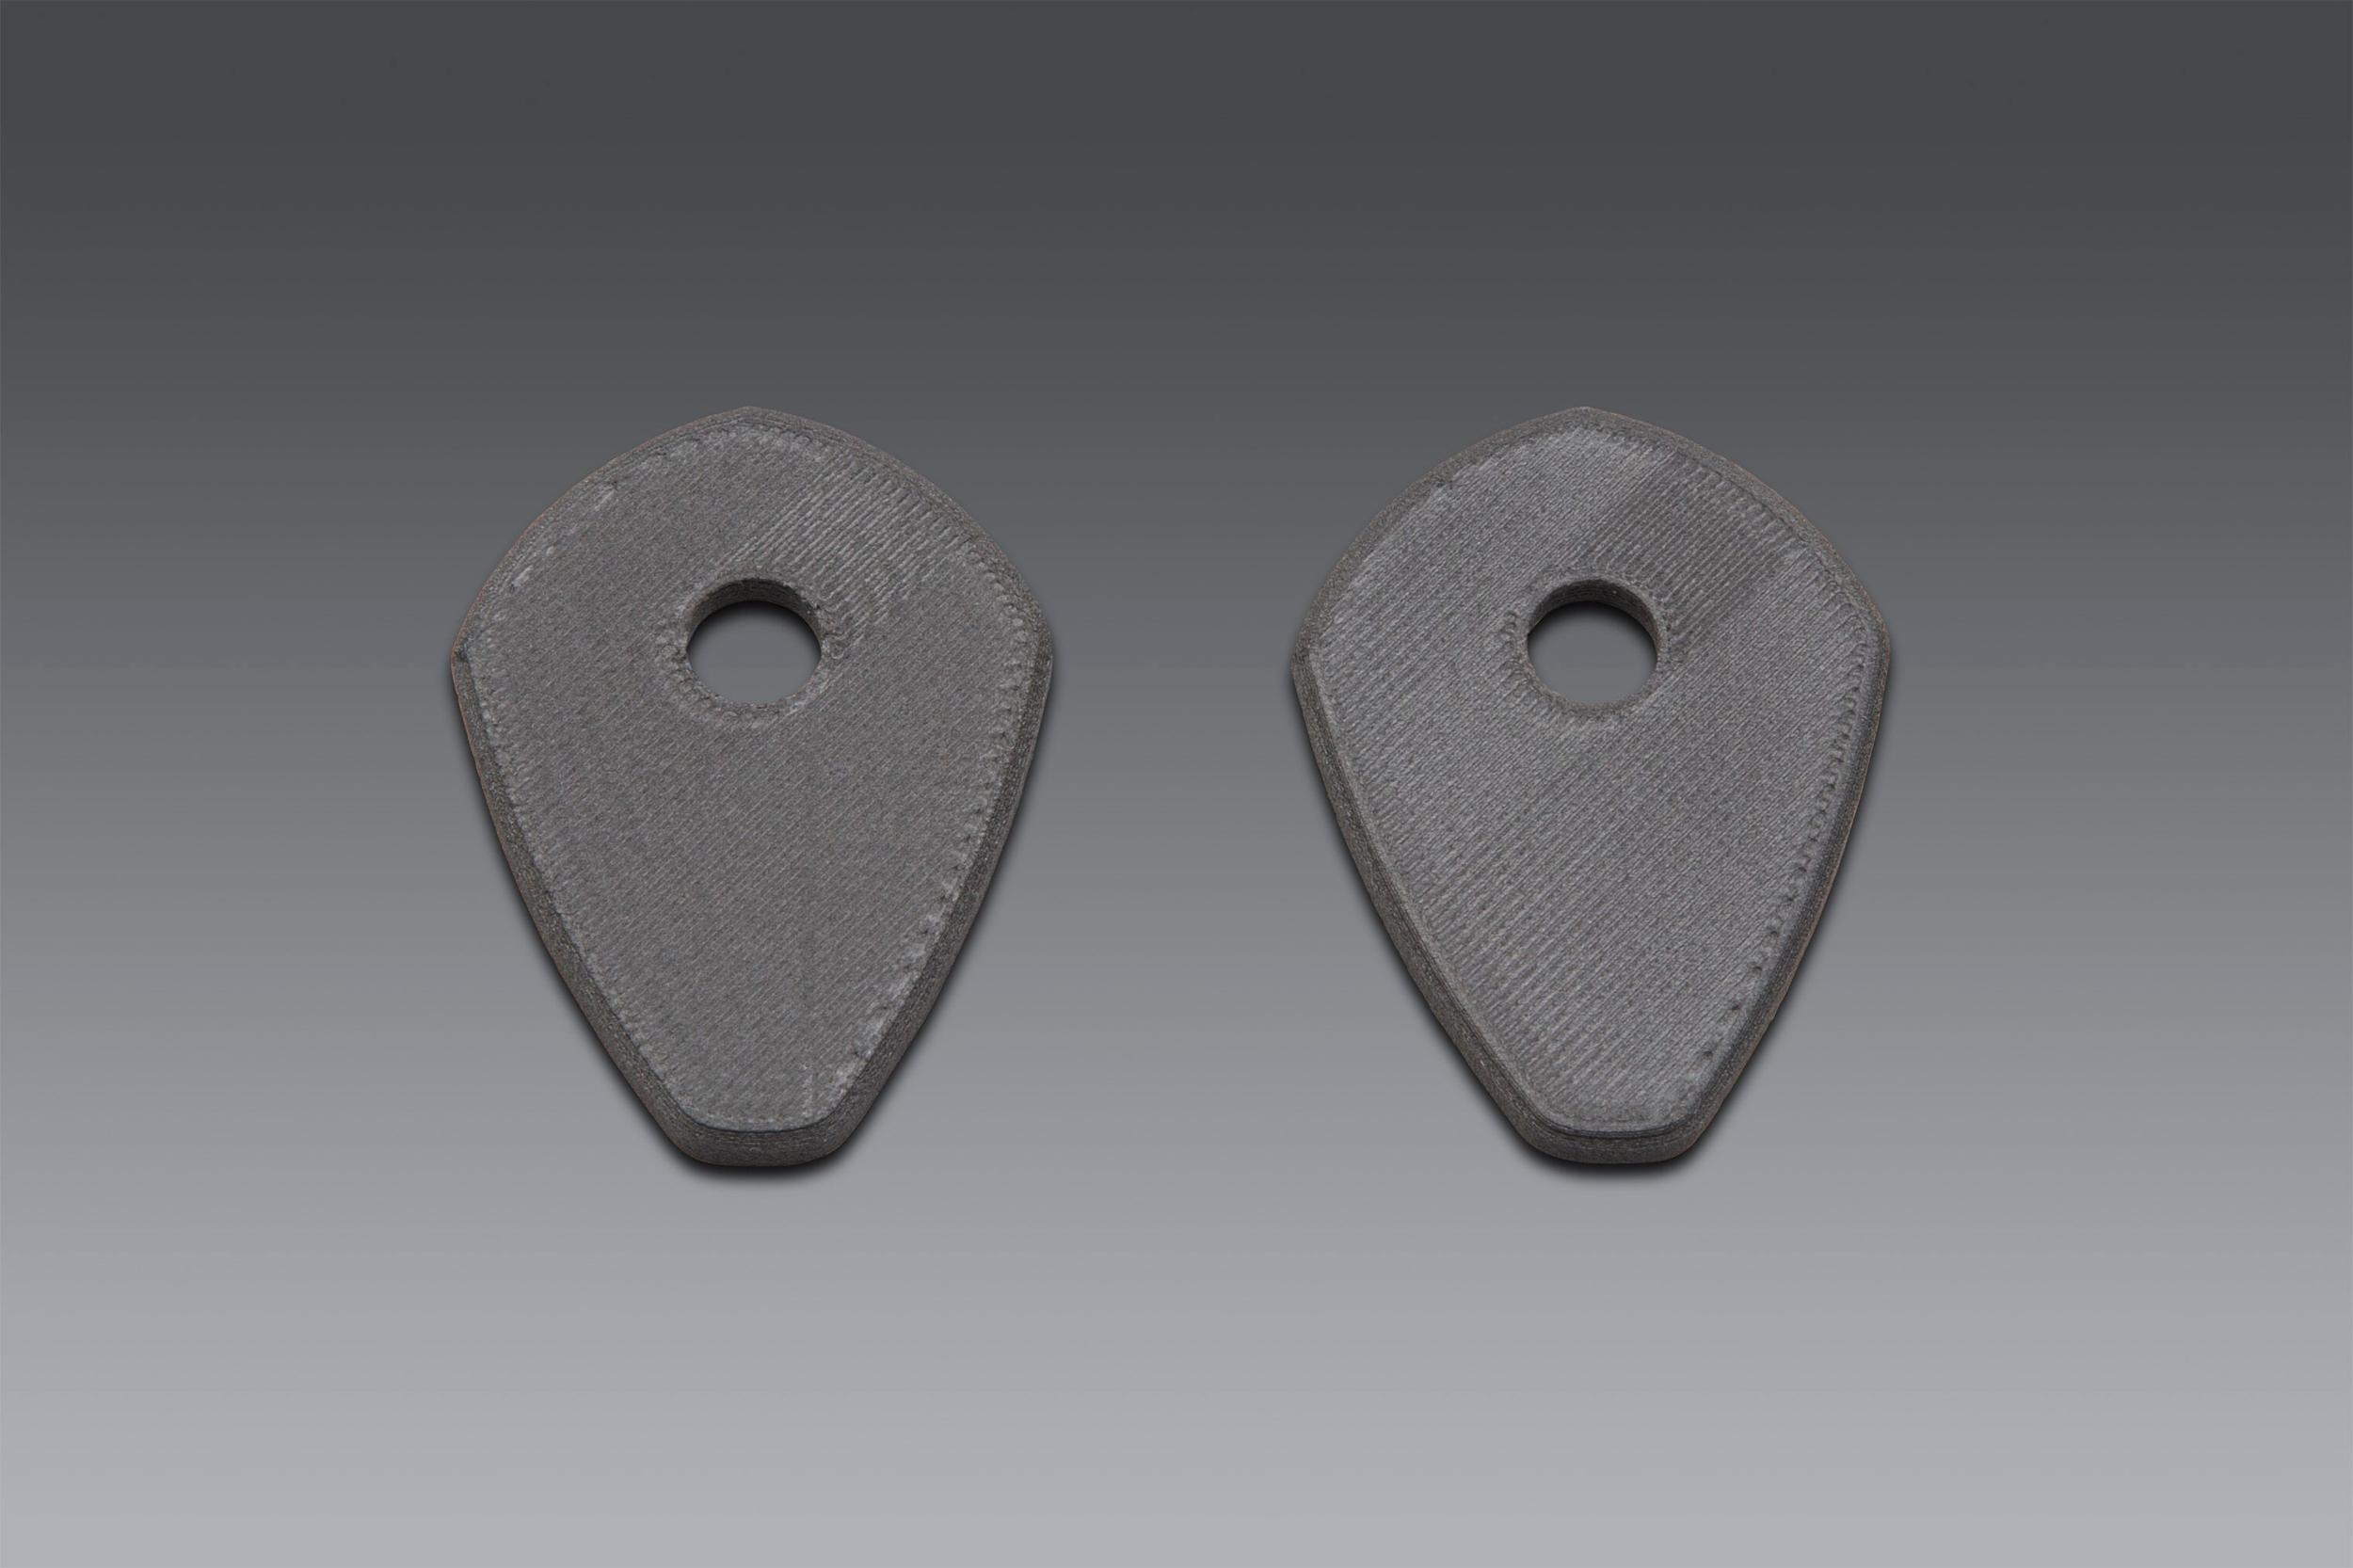 Yoshimura 2018-19 Honda CBR300R Front Turn Signal 3D printed Mount Plates